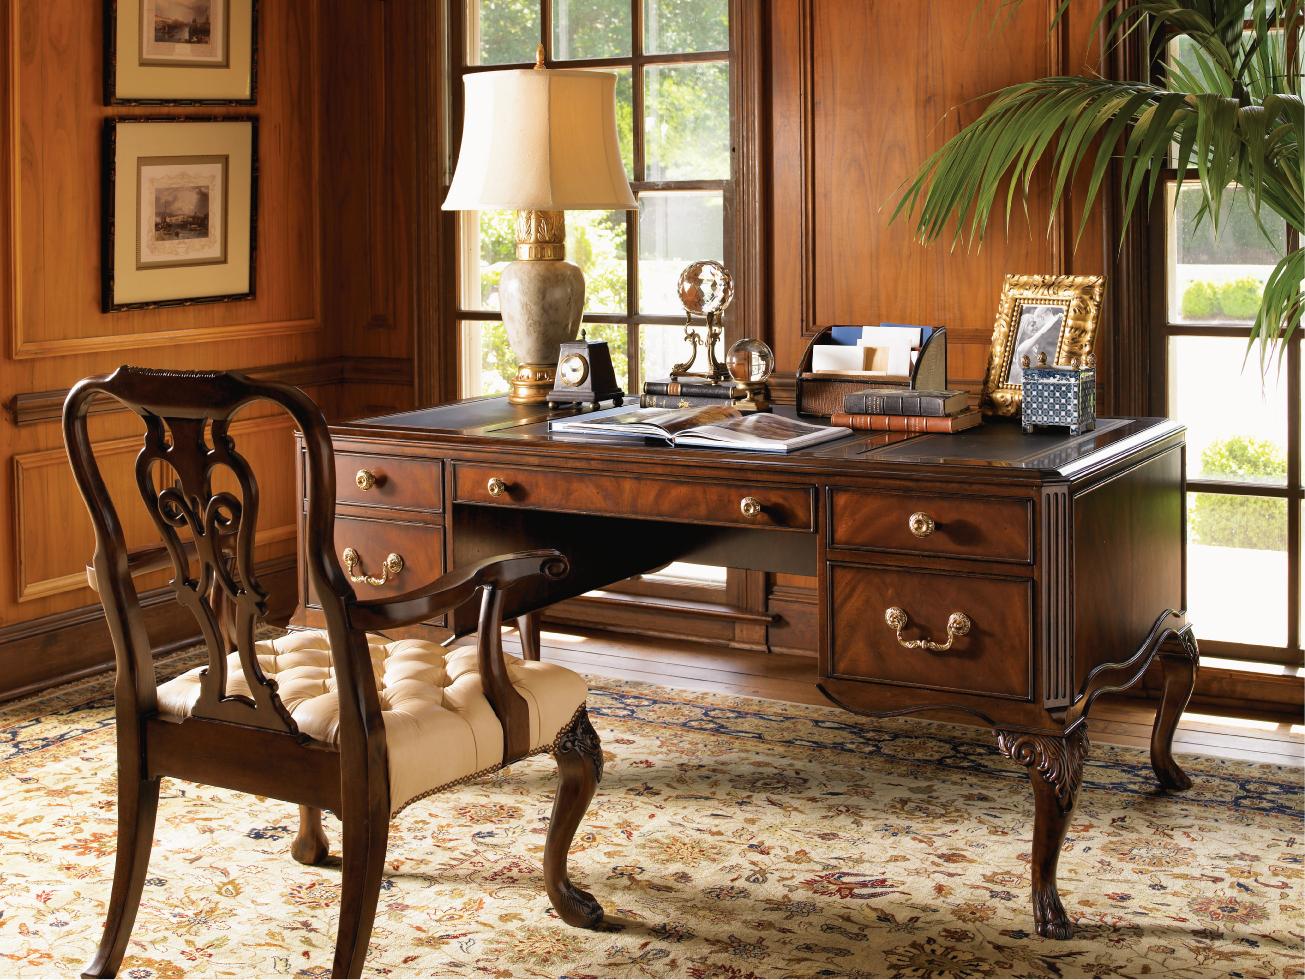 Image result for Get Antique Office Desks For Decorating Your Office